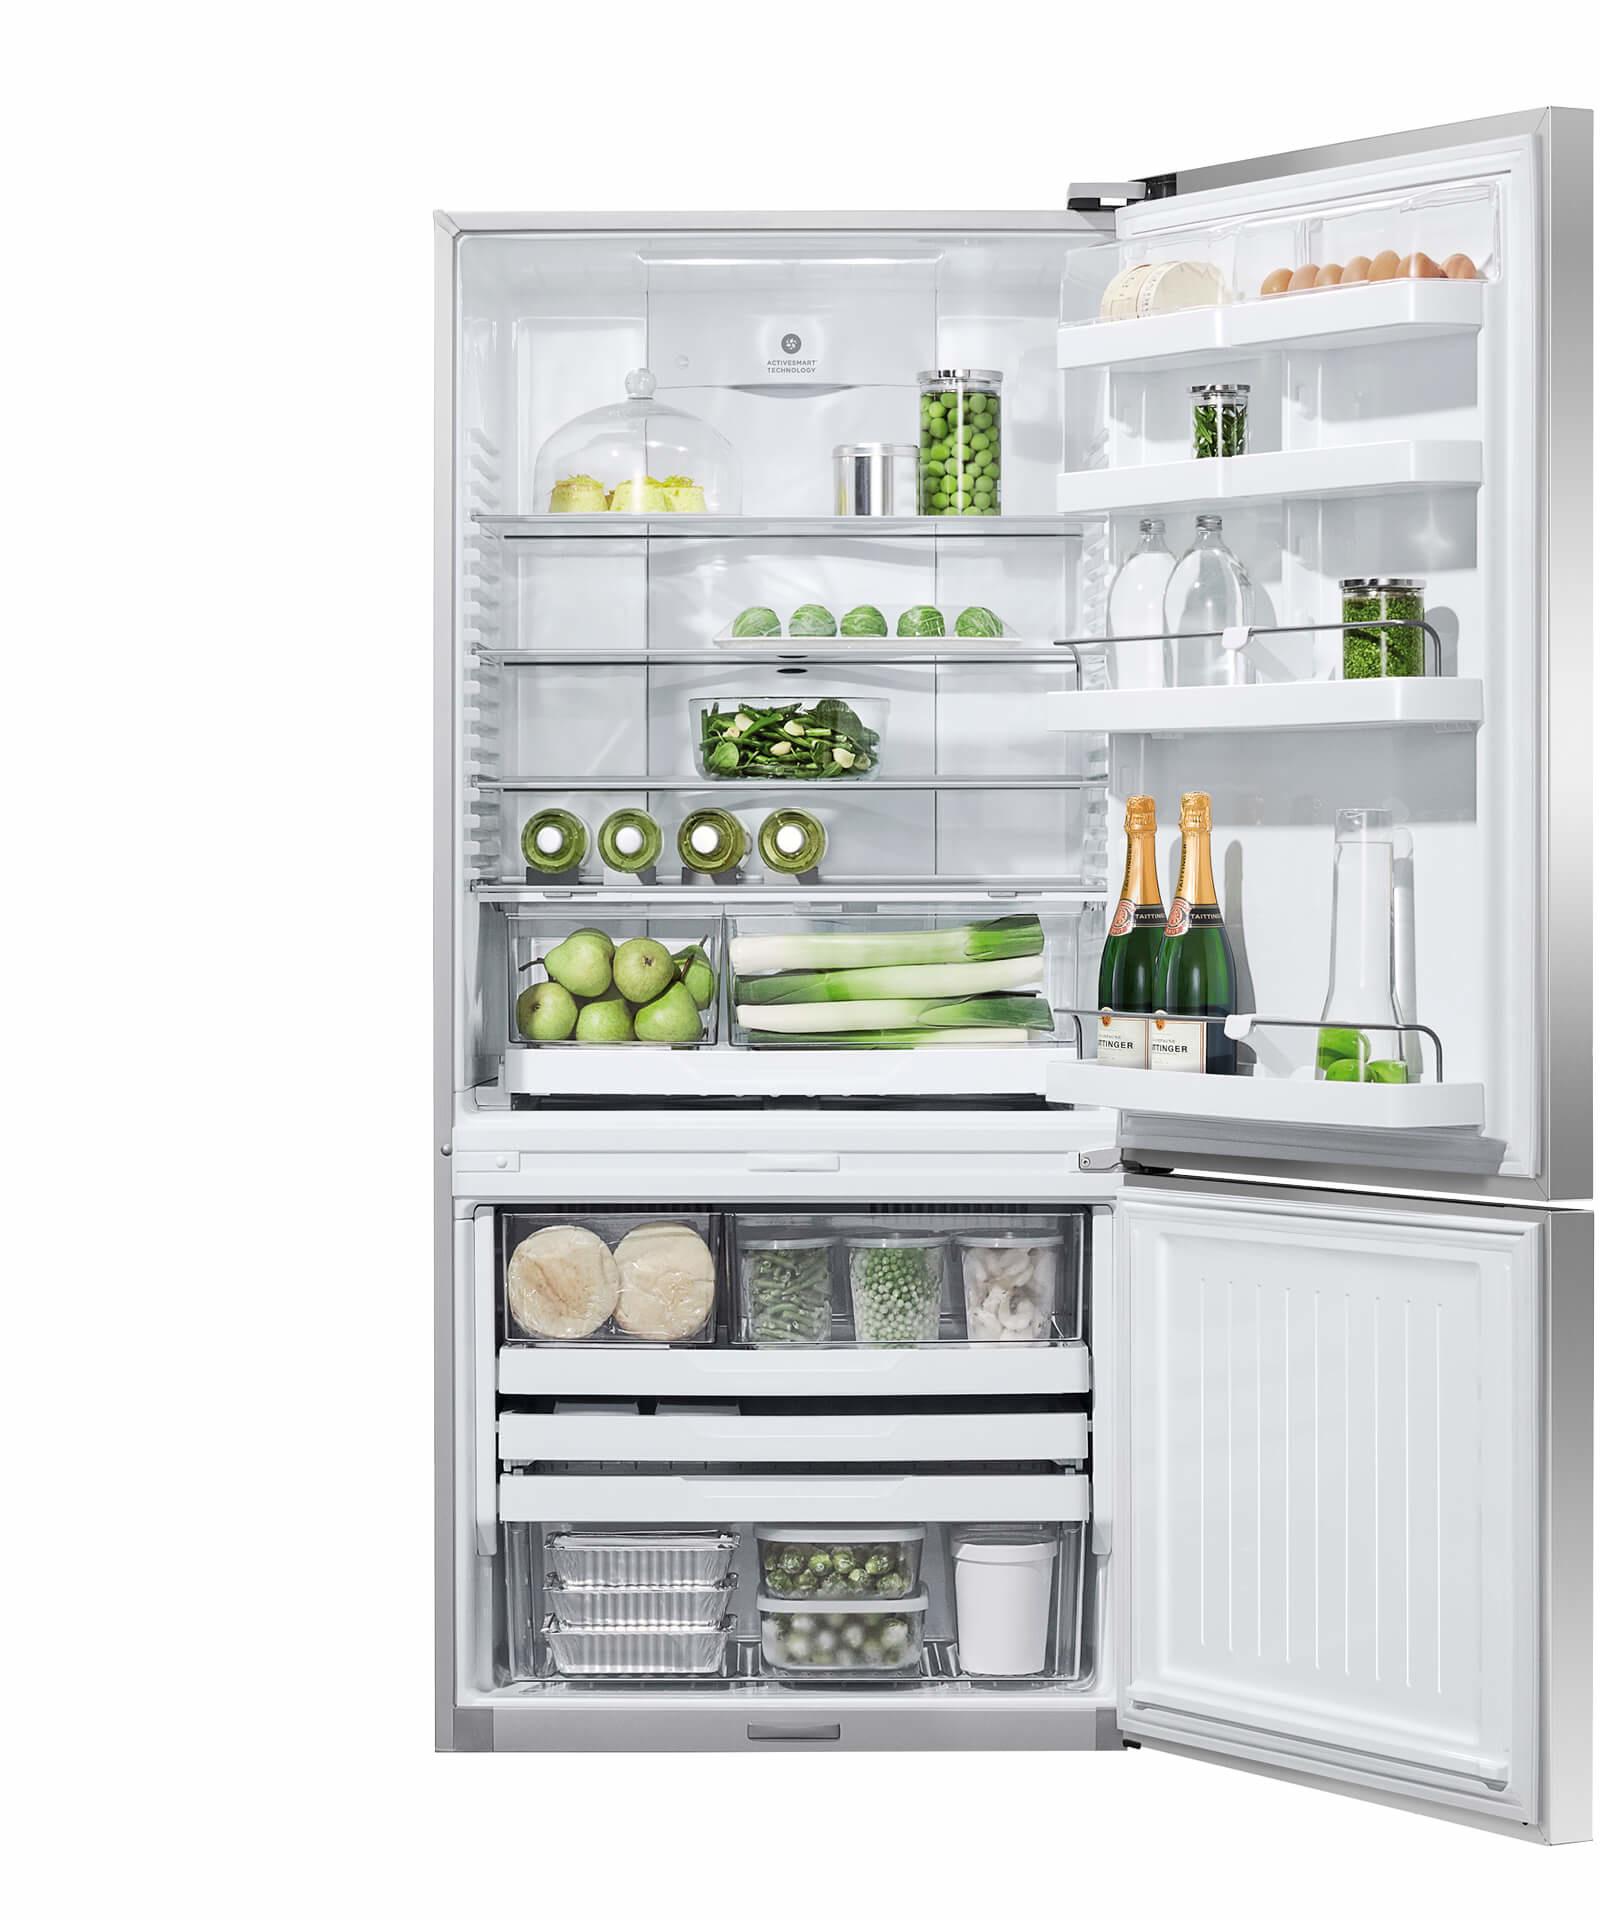 Fishder & Paykel Fridge Freezer 519L (Factory Second)